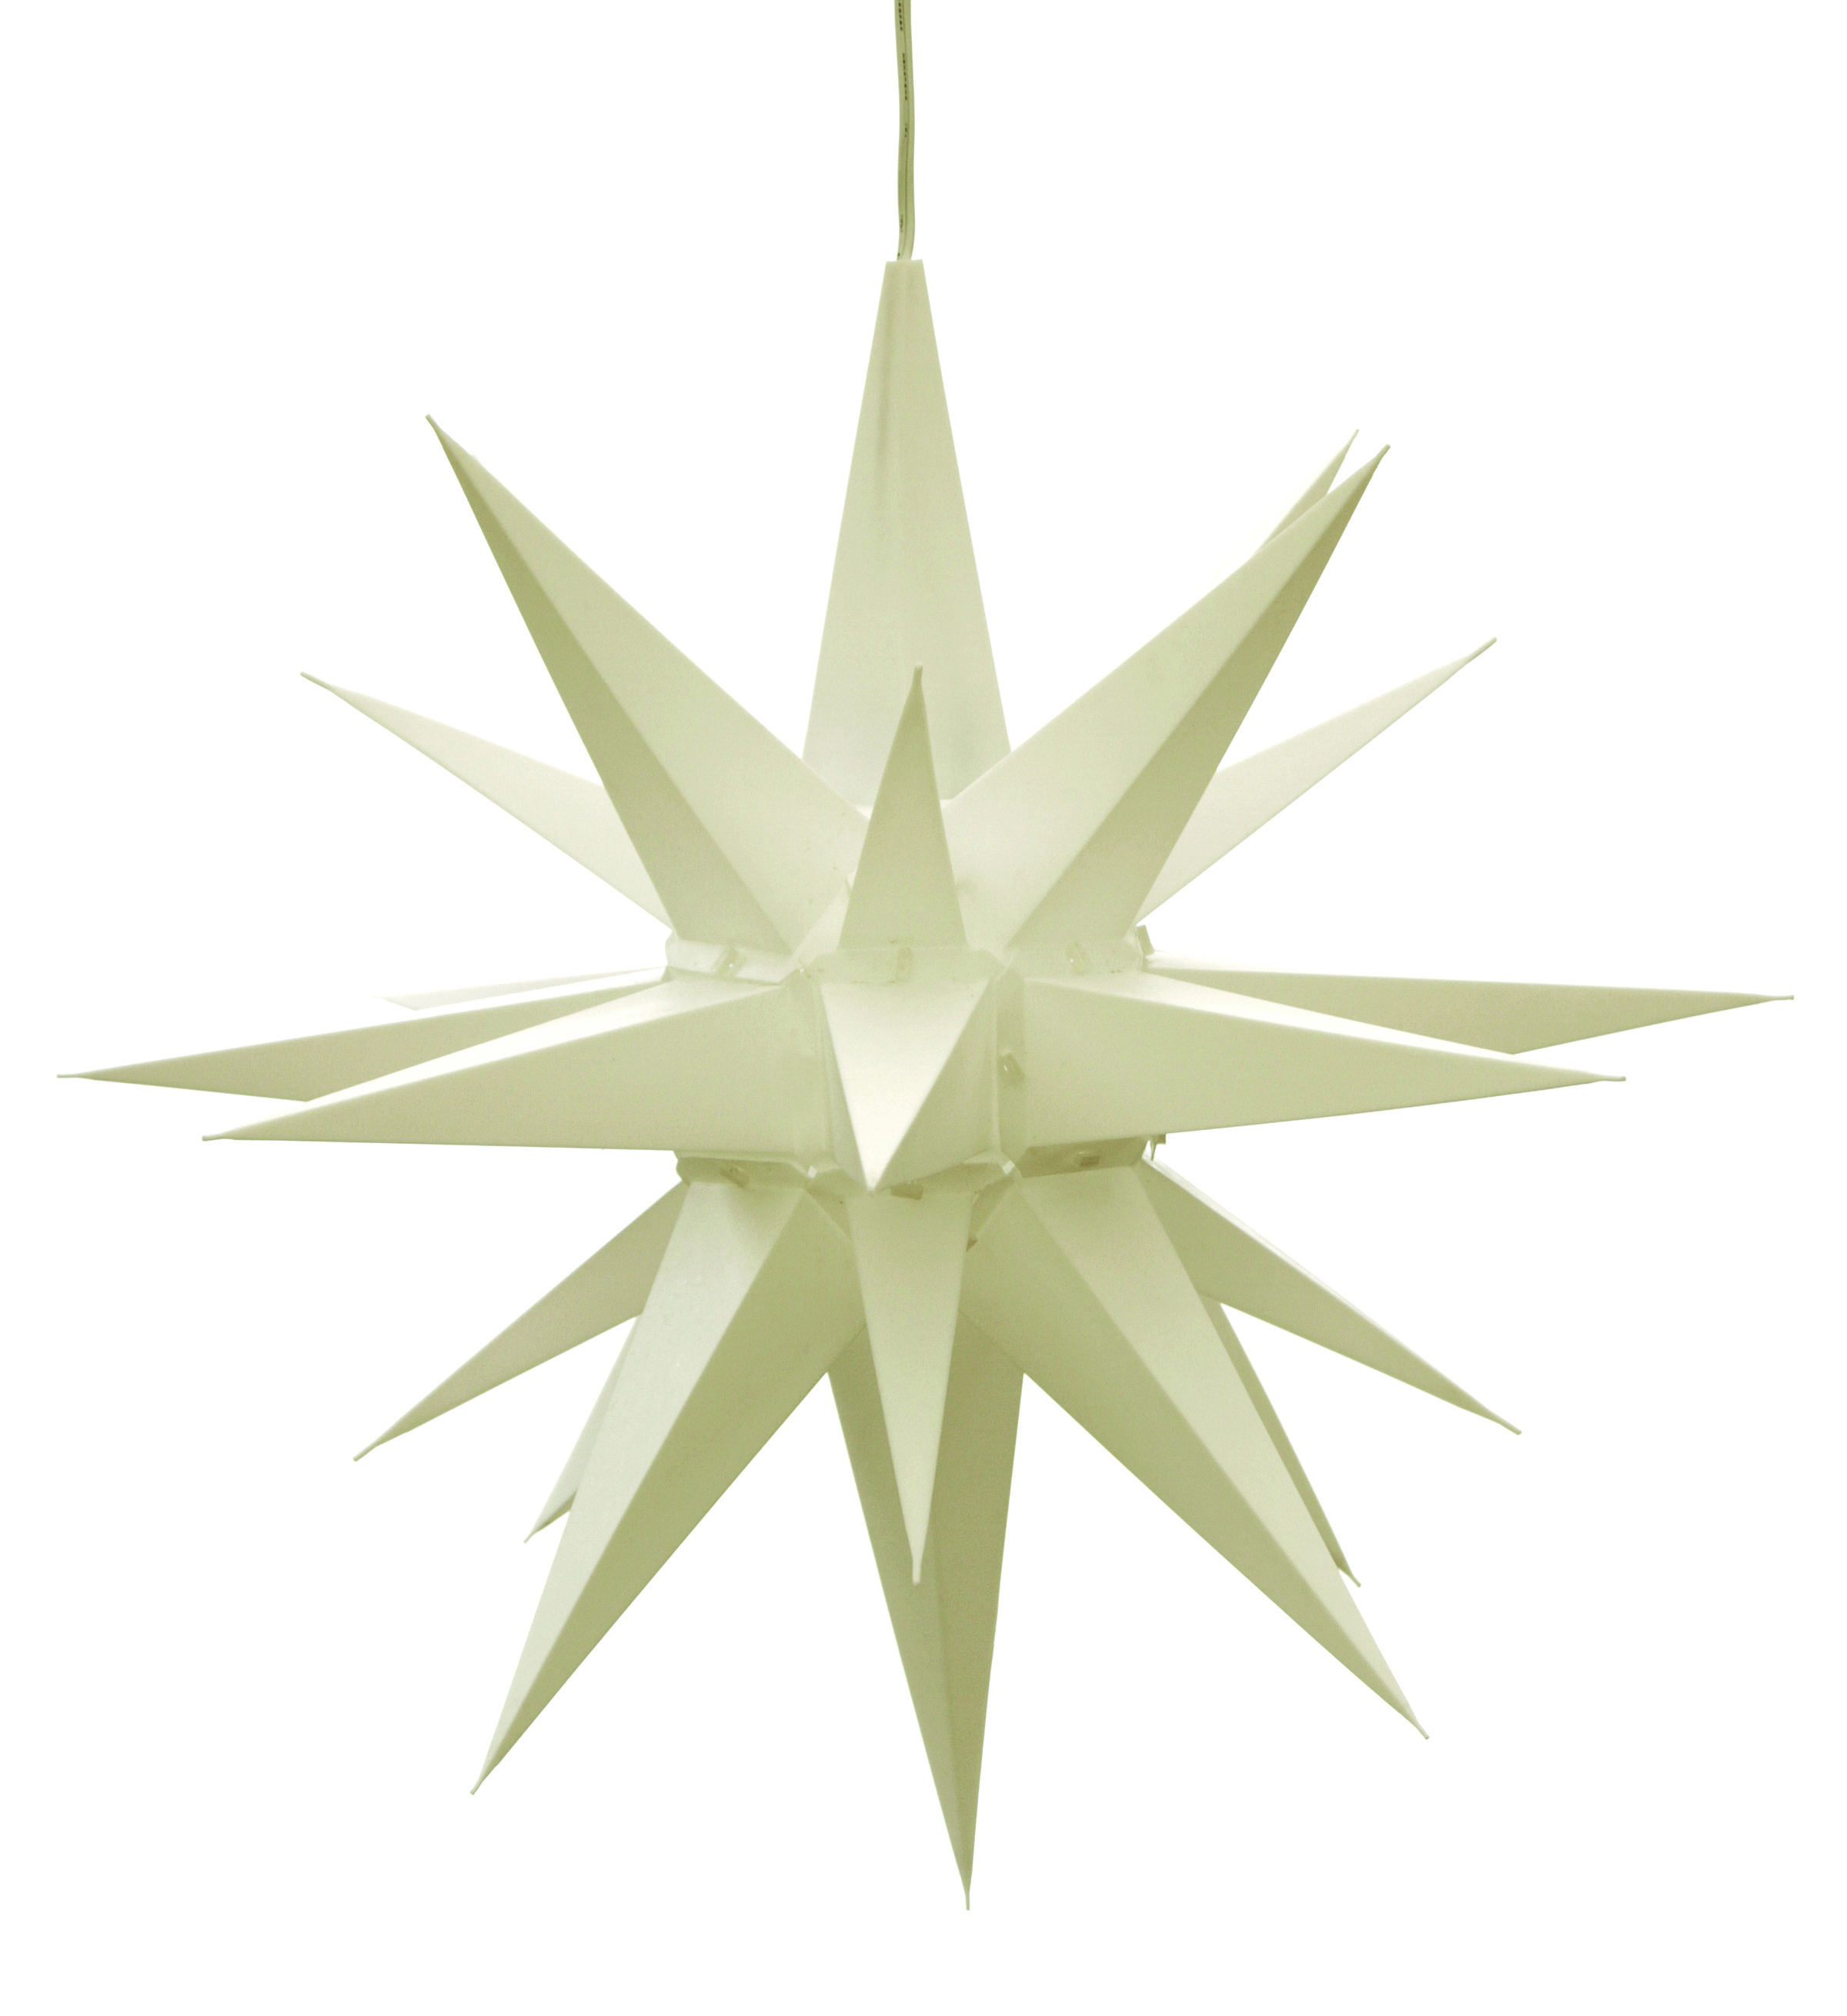 moravian light mason marvelous metal pendant lights large lighting star marvellous chandelier jar hanging